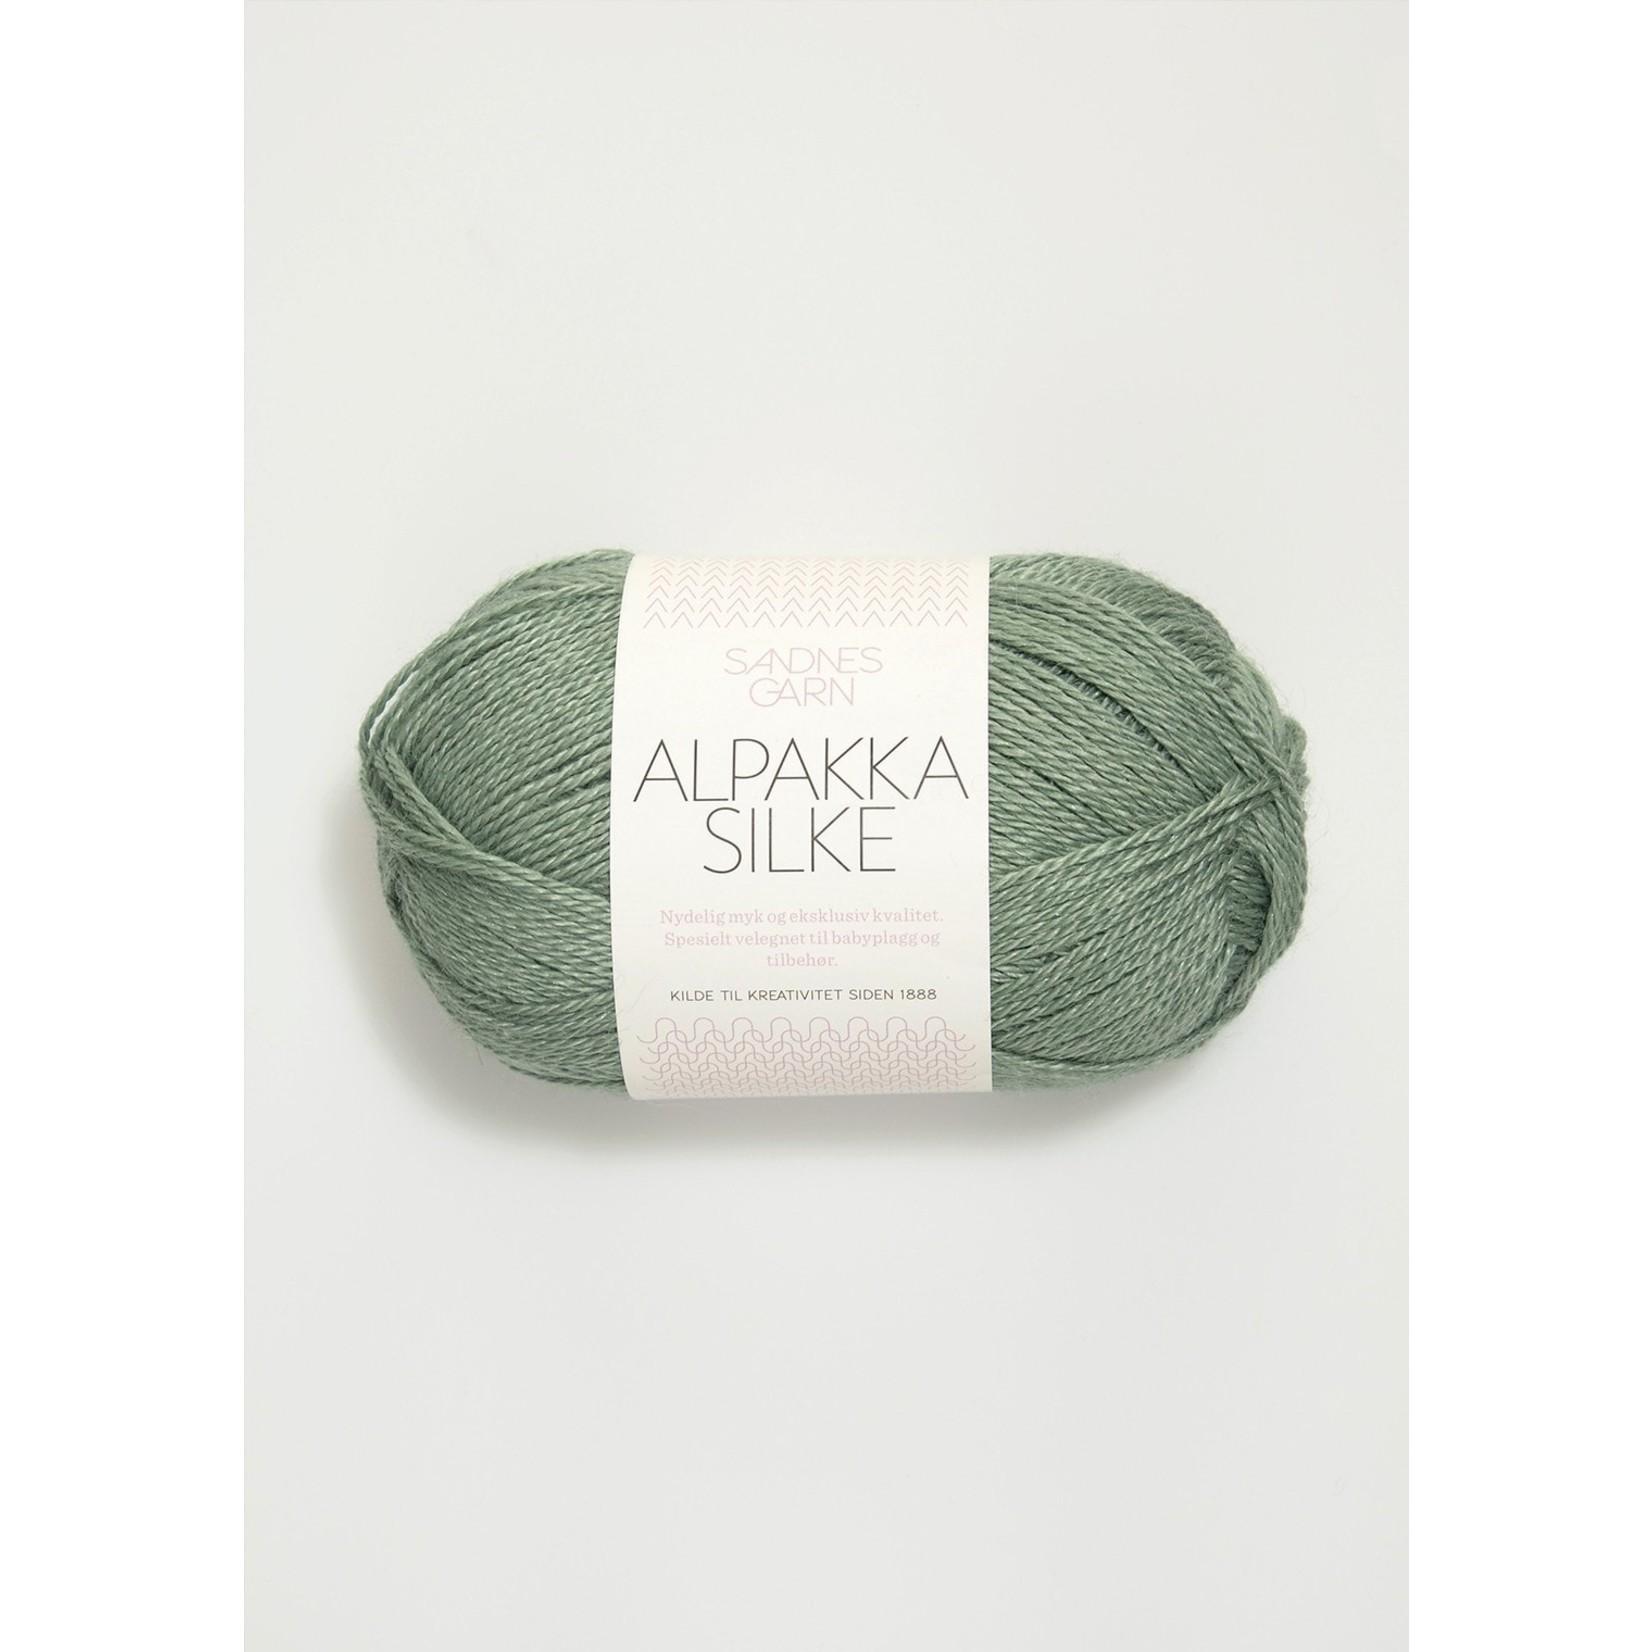 Sandnes Garn Alpakka Silke, 7741, Dusty Green